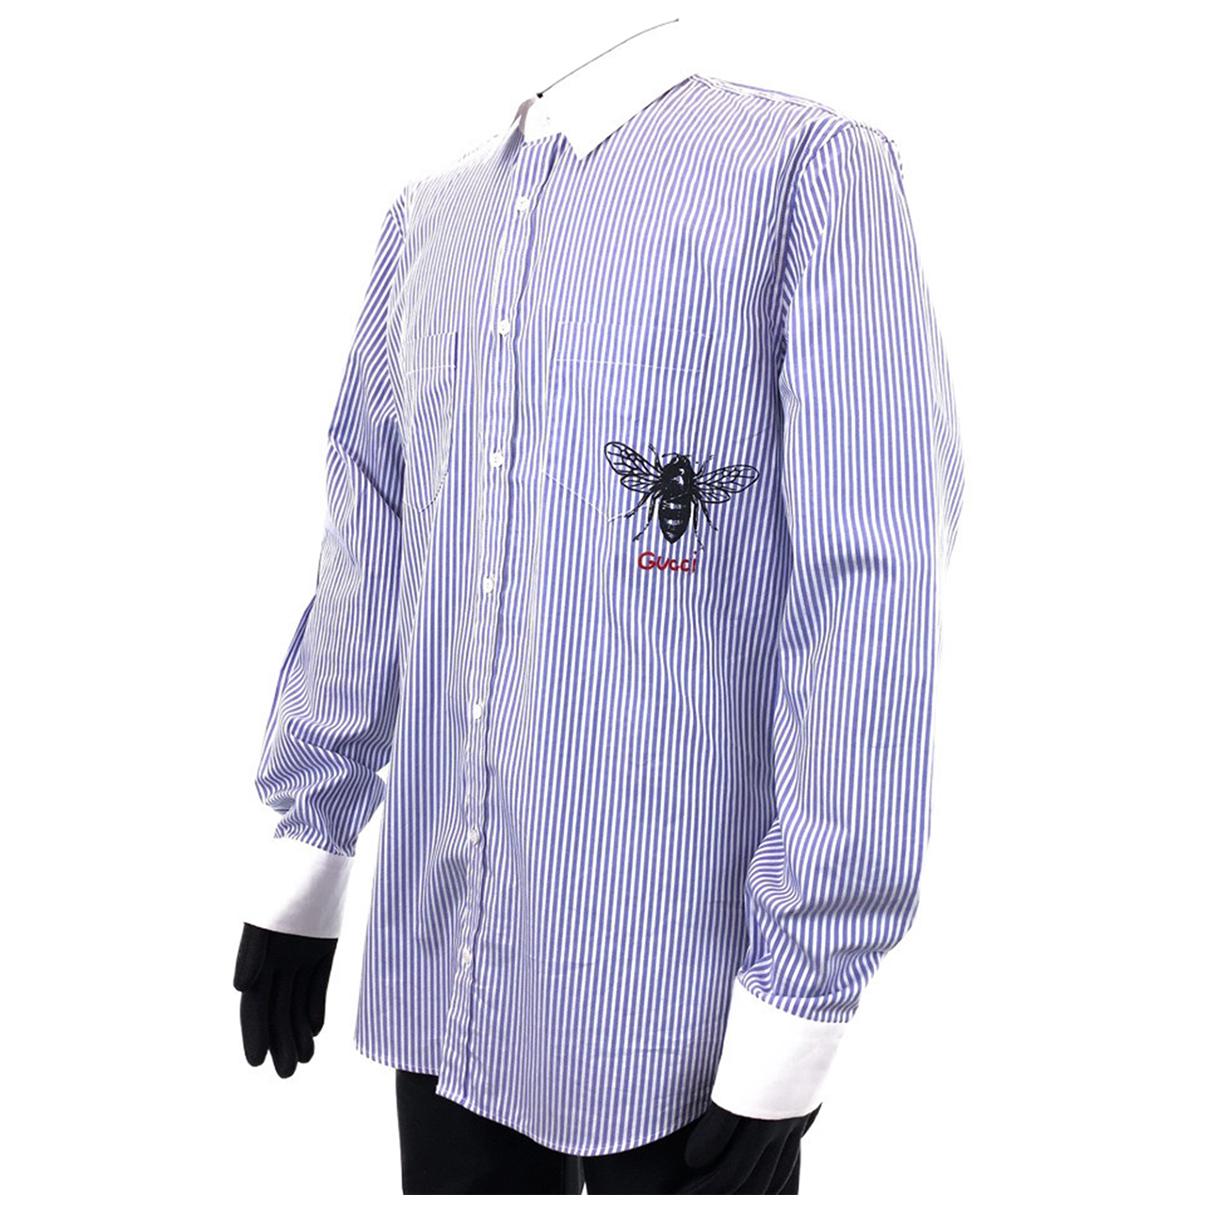 Gucci N Cotton T-shirts for Men M International